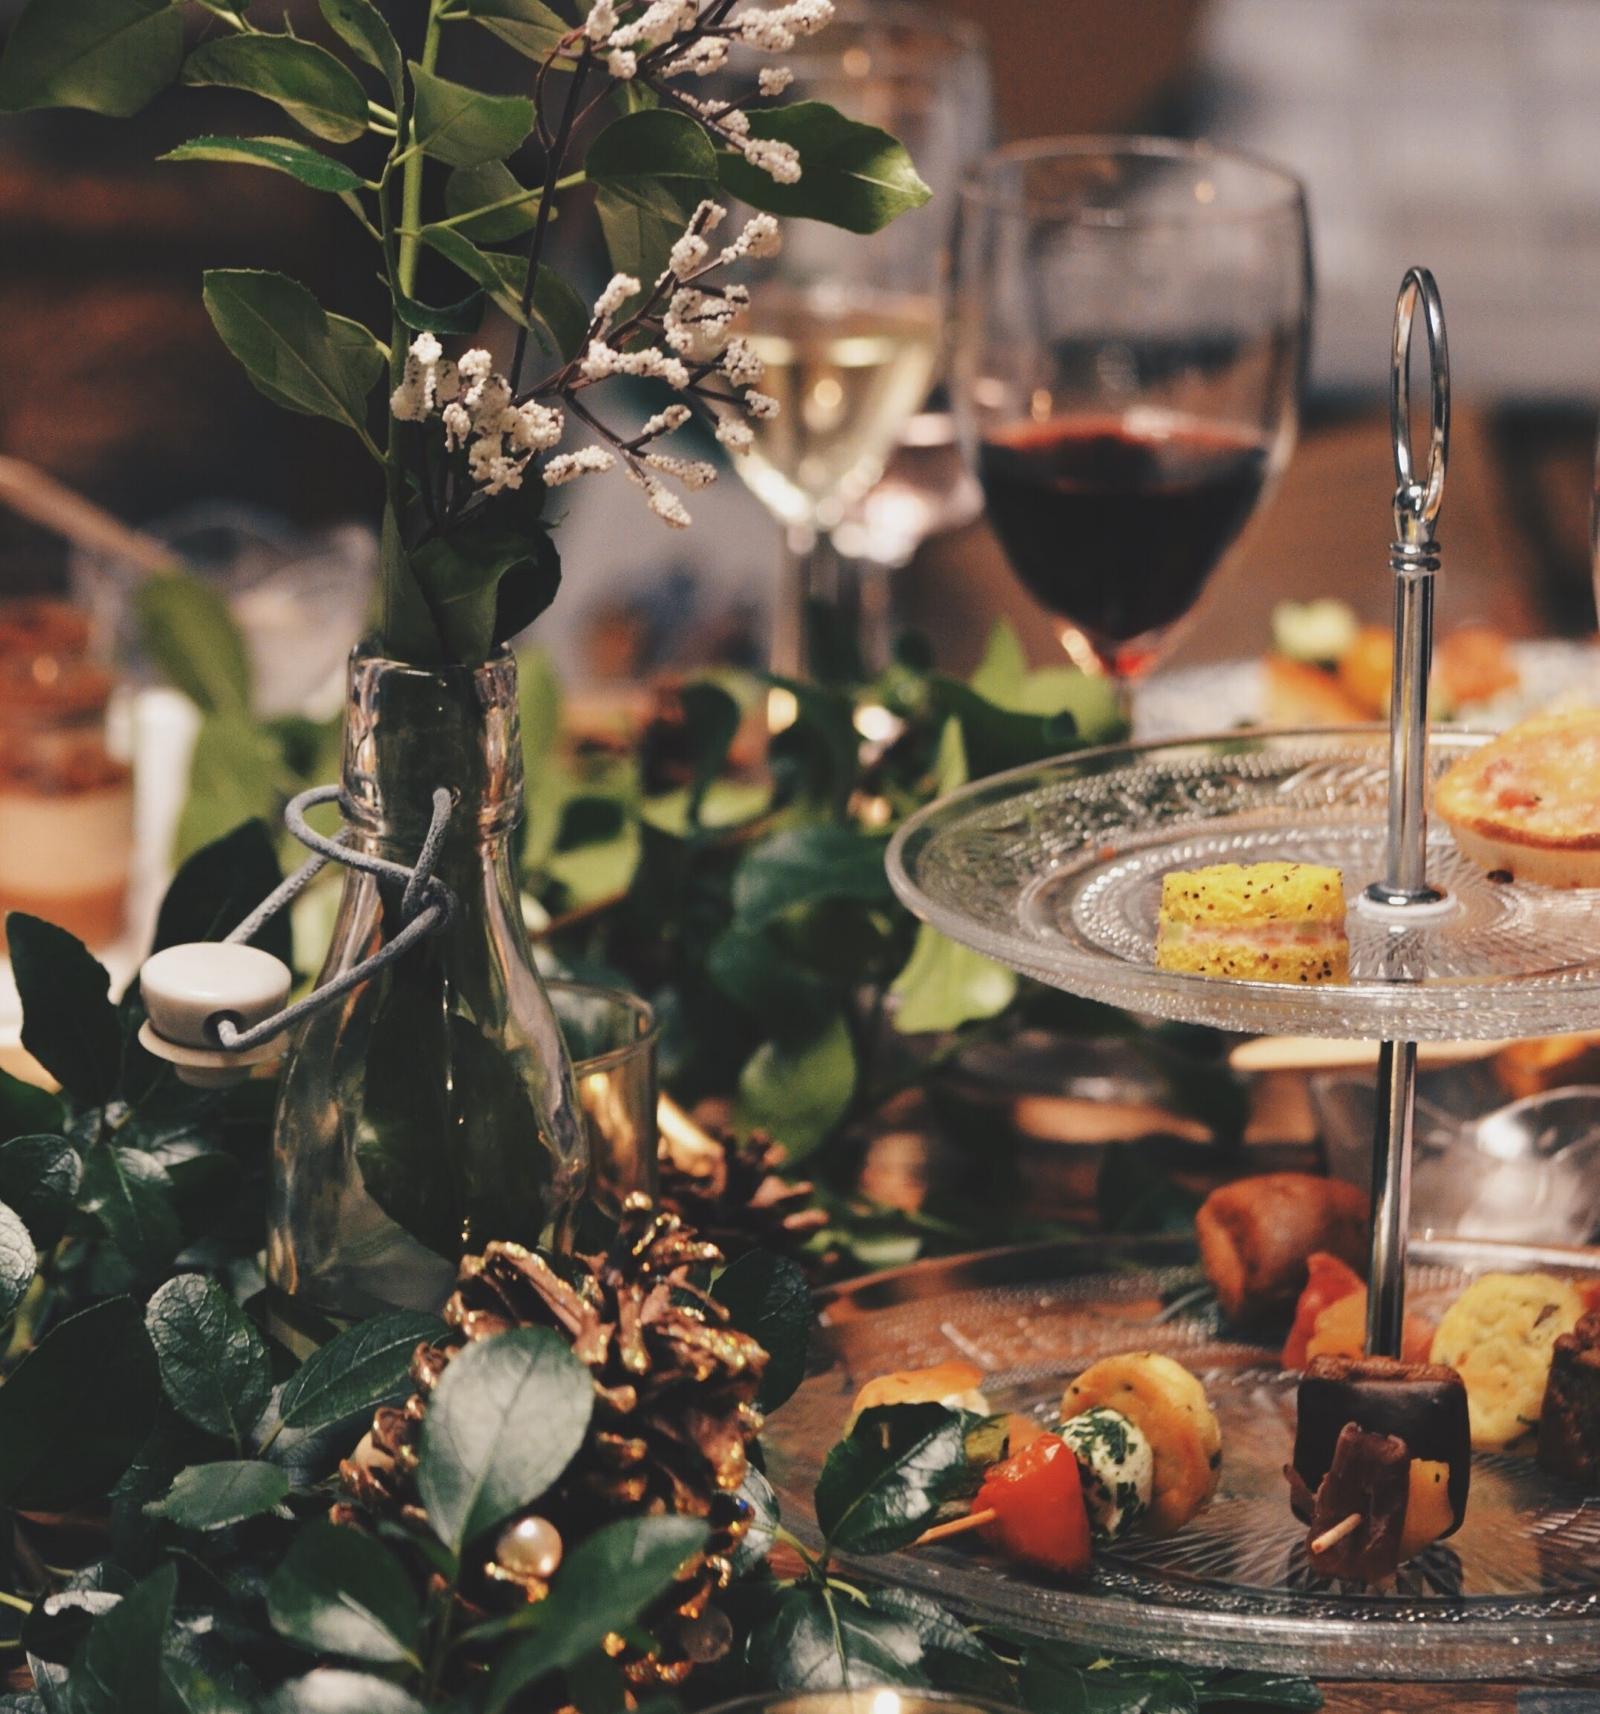 snacking-appetizers-food-away-spoil-dinner.jpg